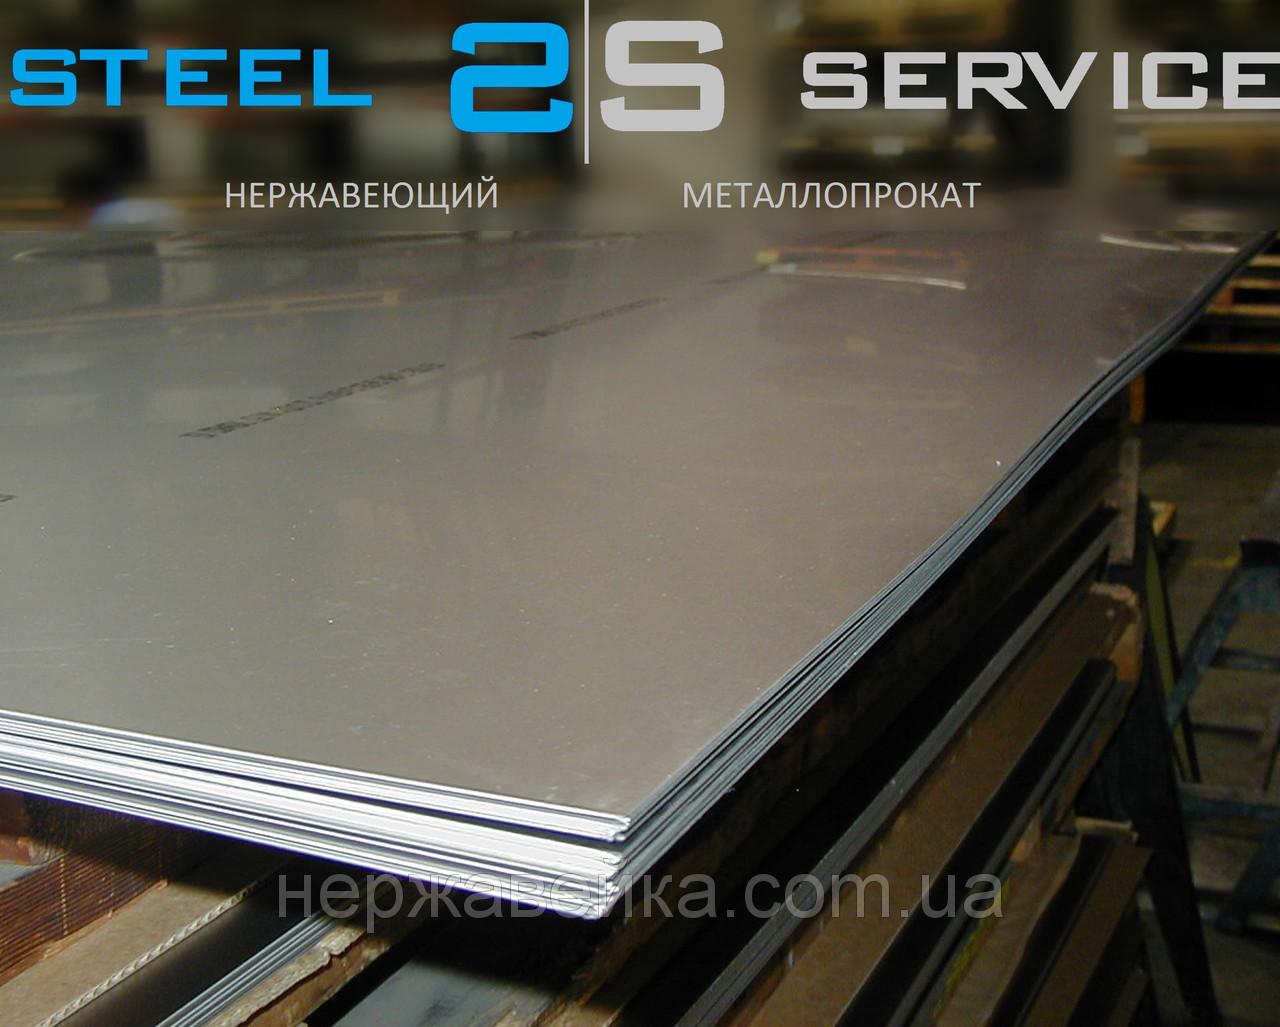 Нержавеющий лист 5х1250х2500мм AISI 430(12Х17) 2B - матовый, технический